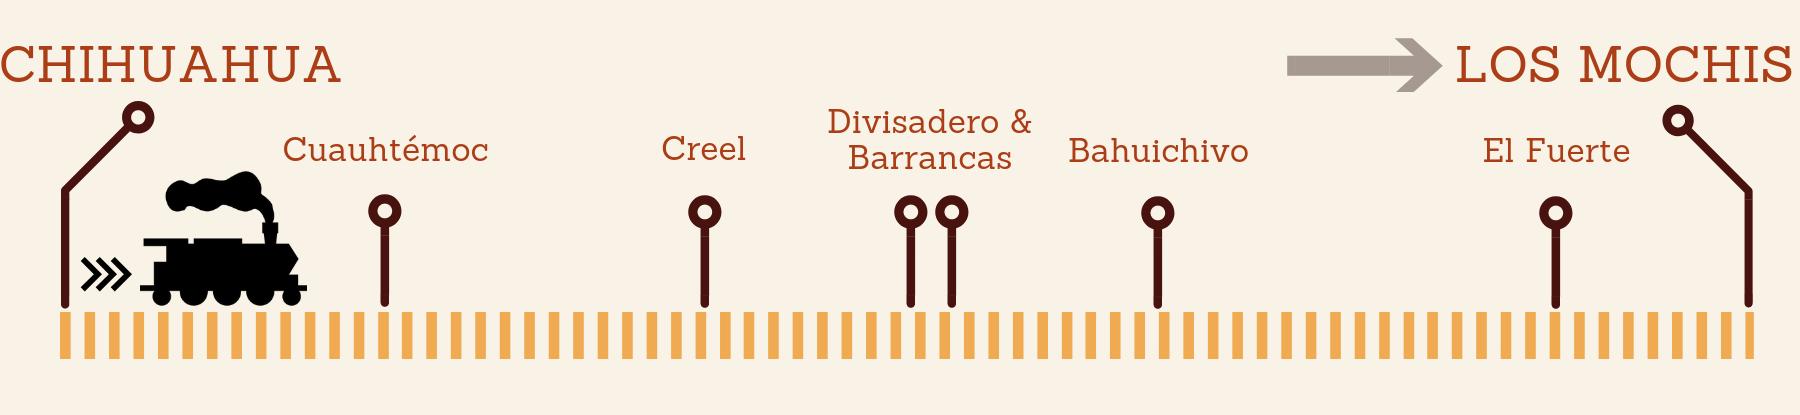 Los Mochis Sinaloa - infographic